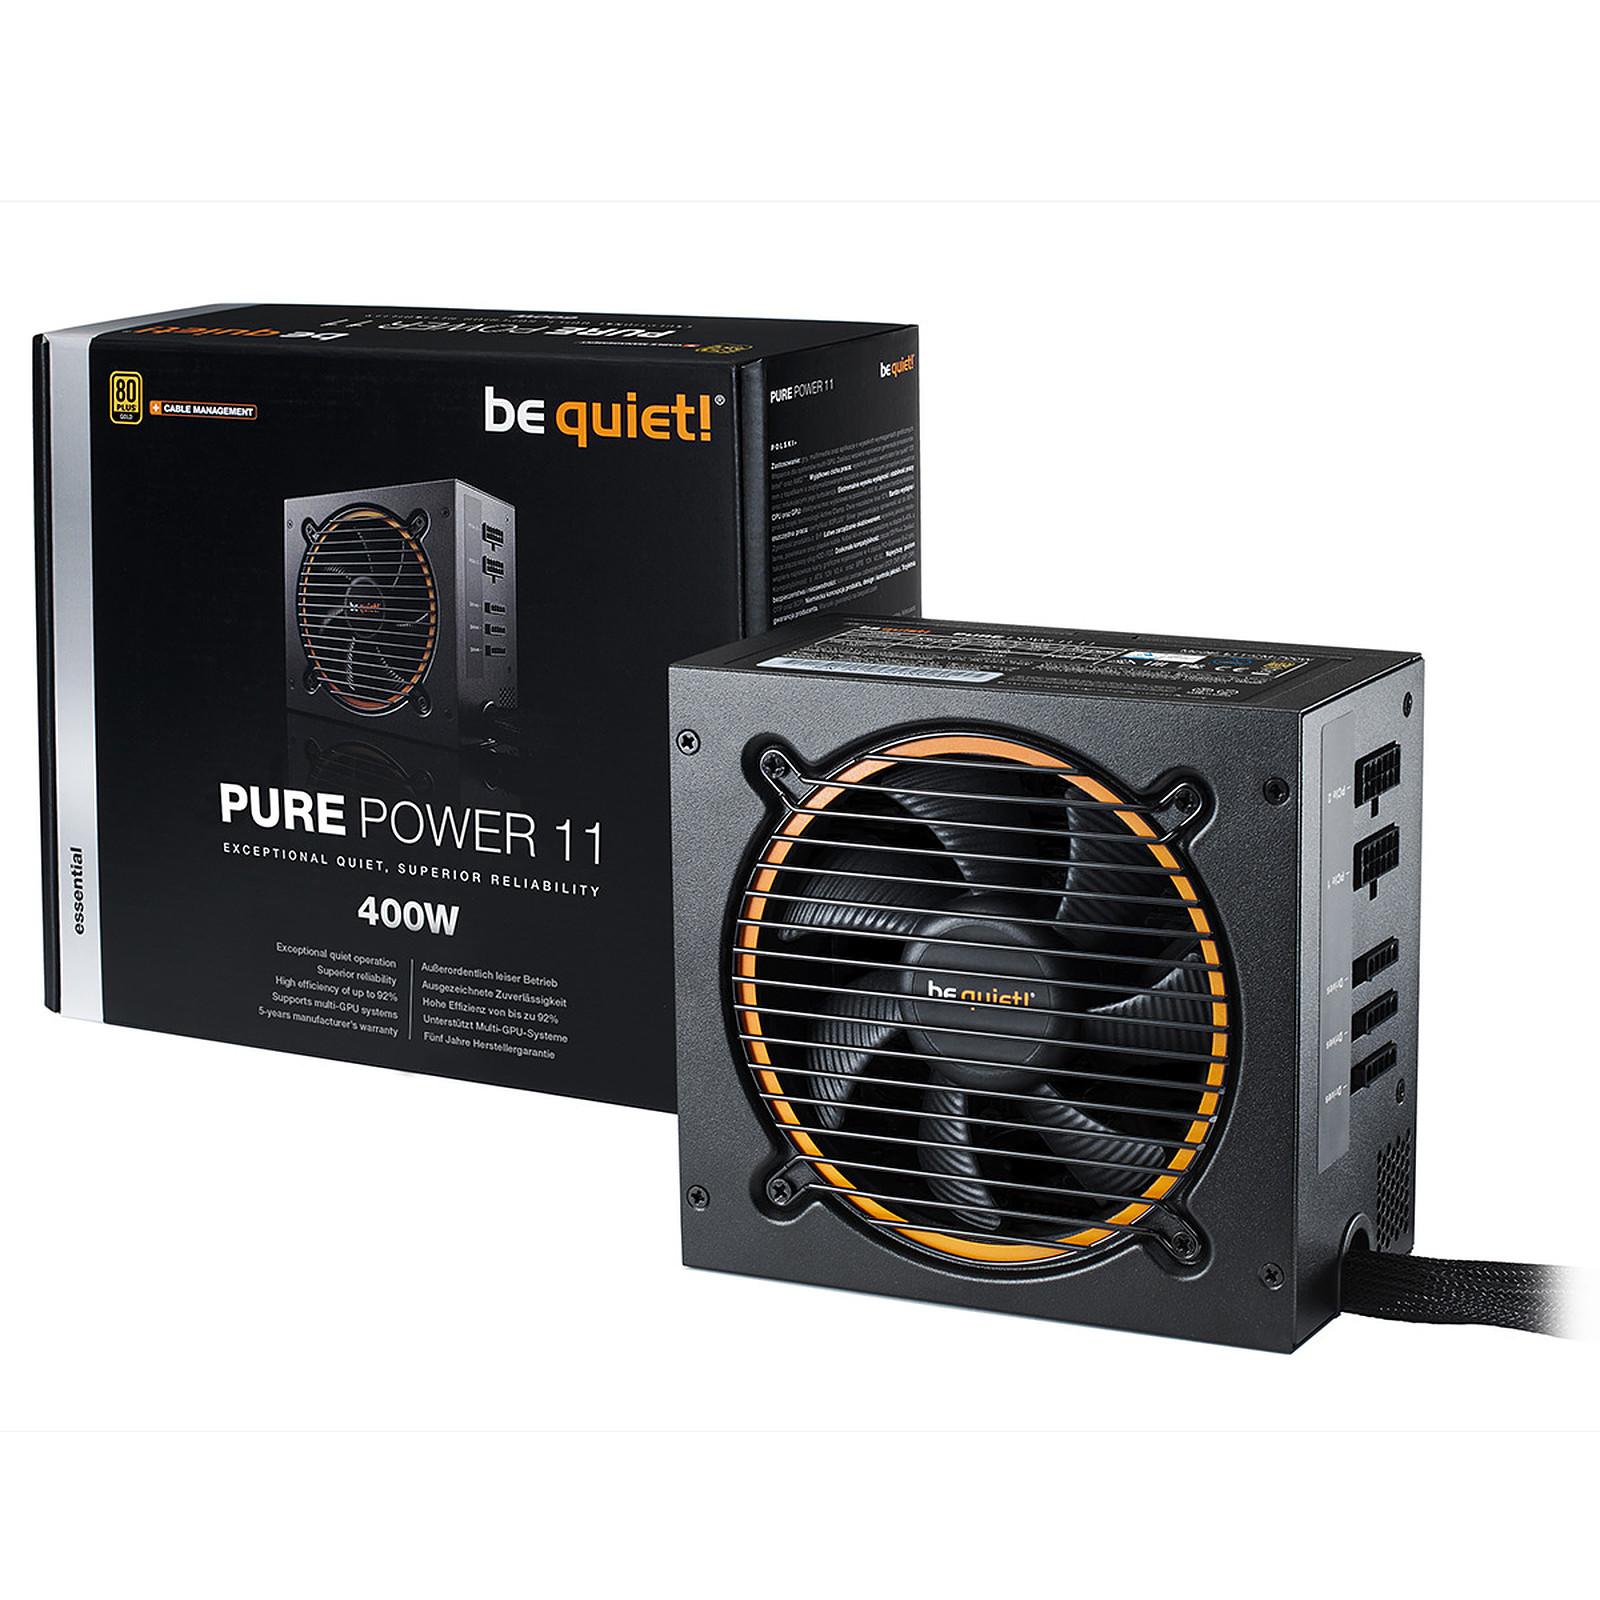 be quiet! Pure Power 11 400W CM 80PLUS Gold